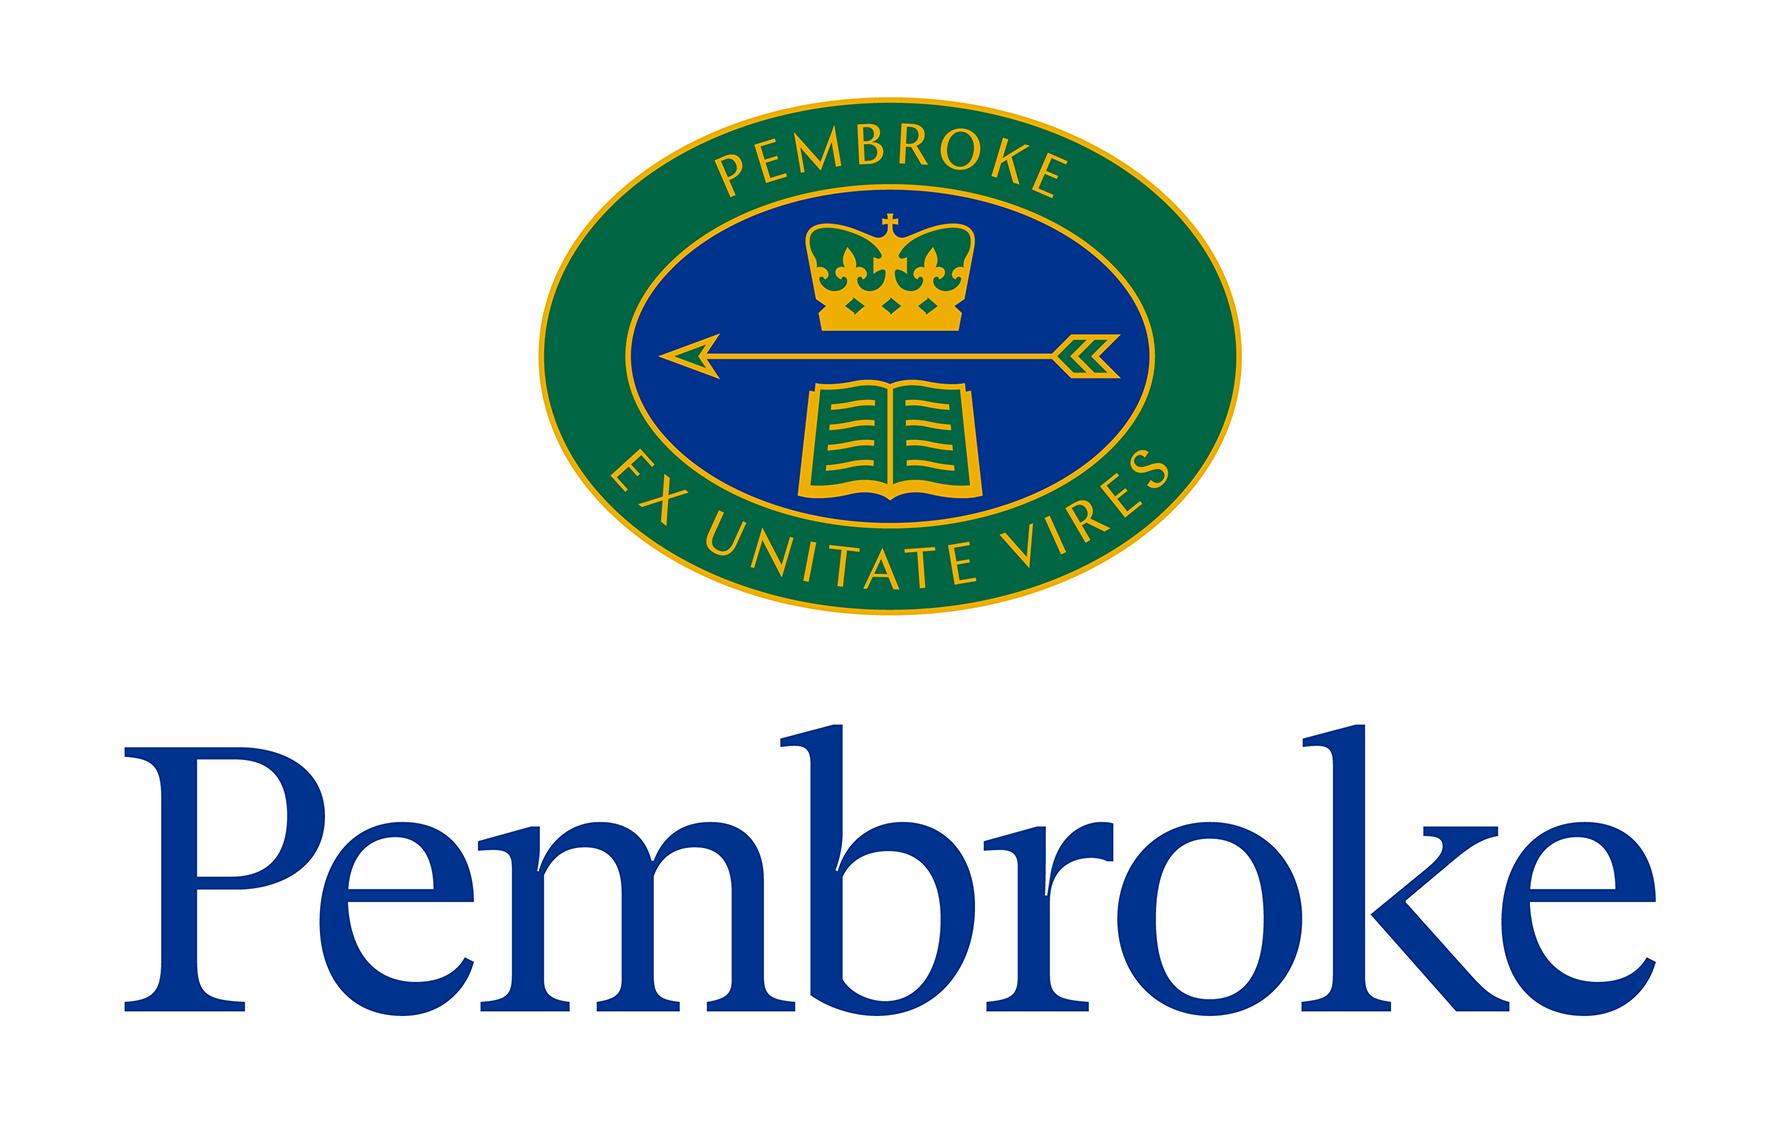 Pembroke School – Marketing and Communications Coordinator